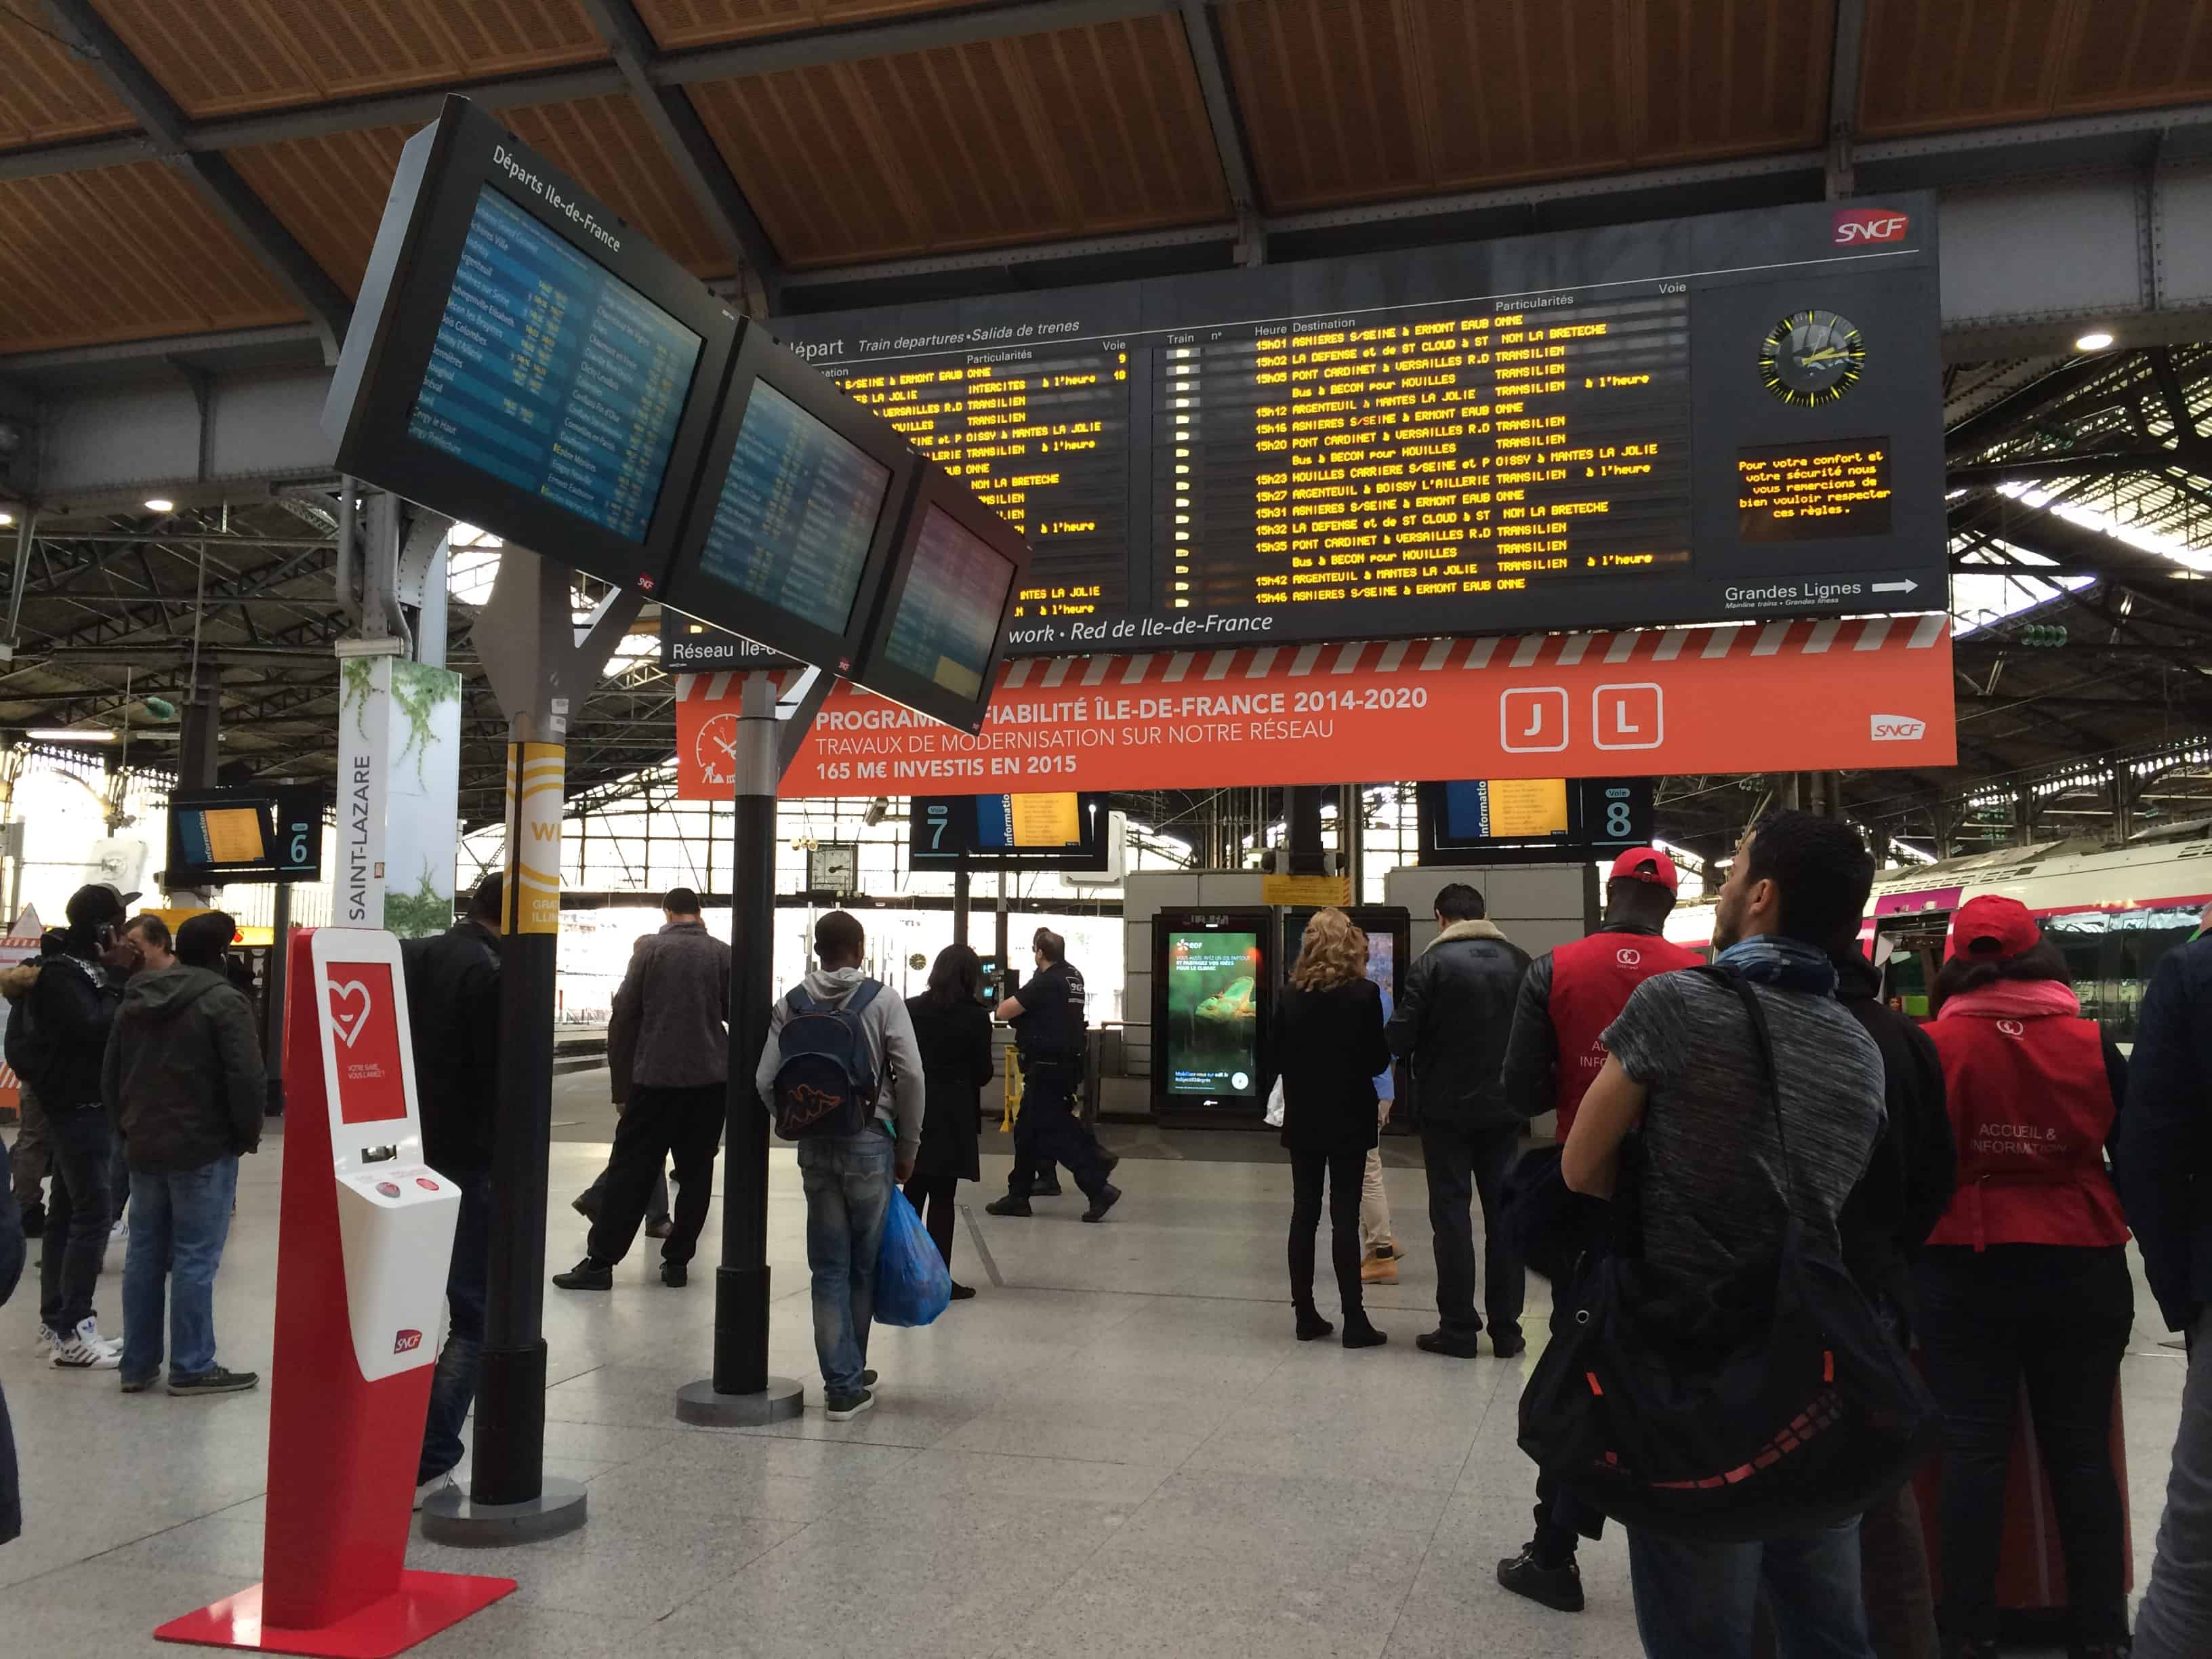 Paris Subway Map Zone 2018.How To Buy Paris Metro Tickets With Photos The Wherever Writer